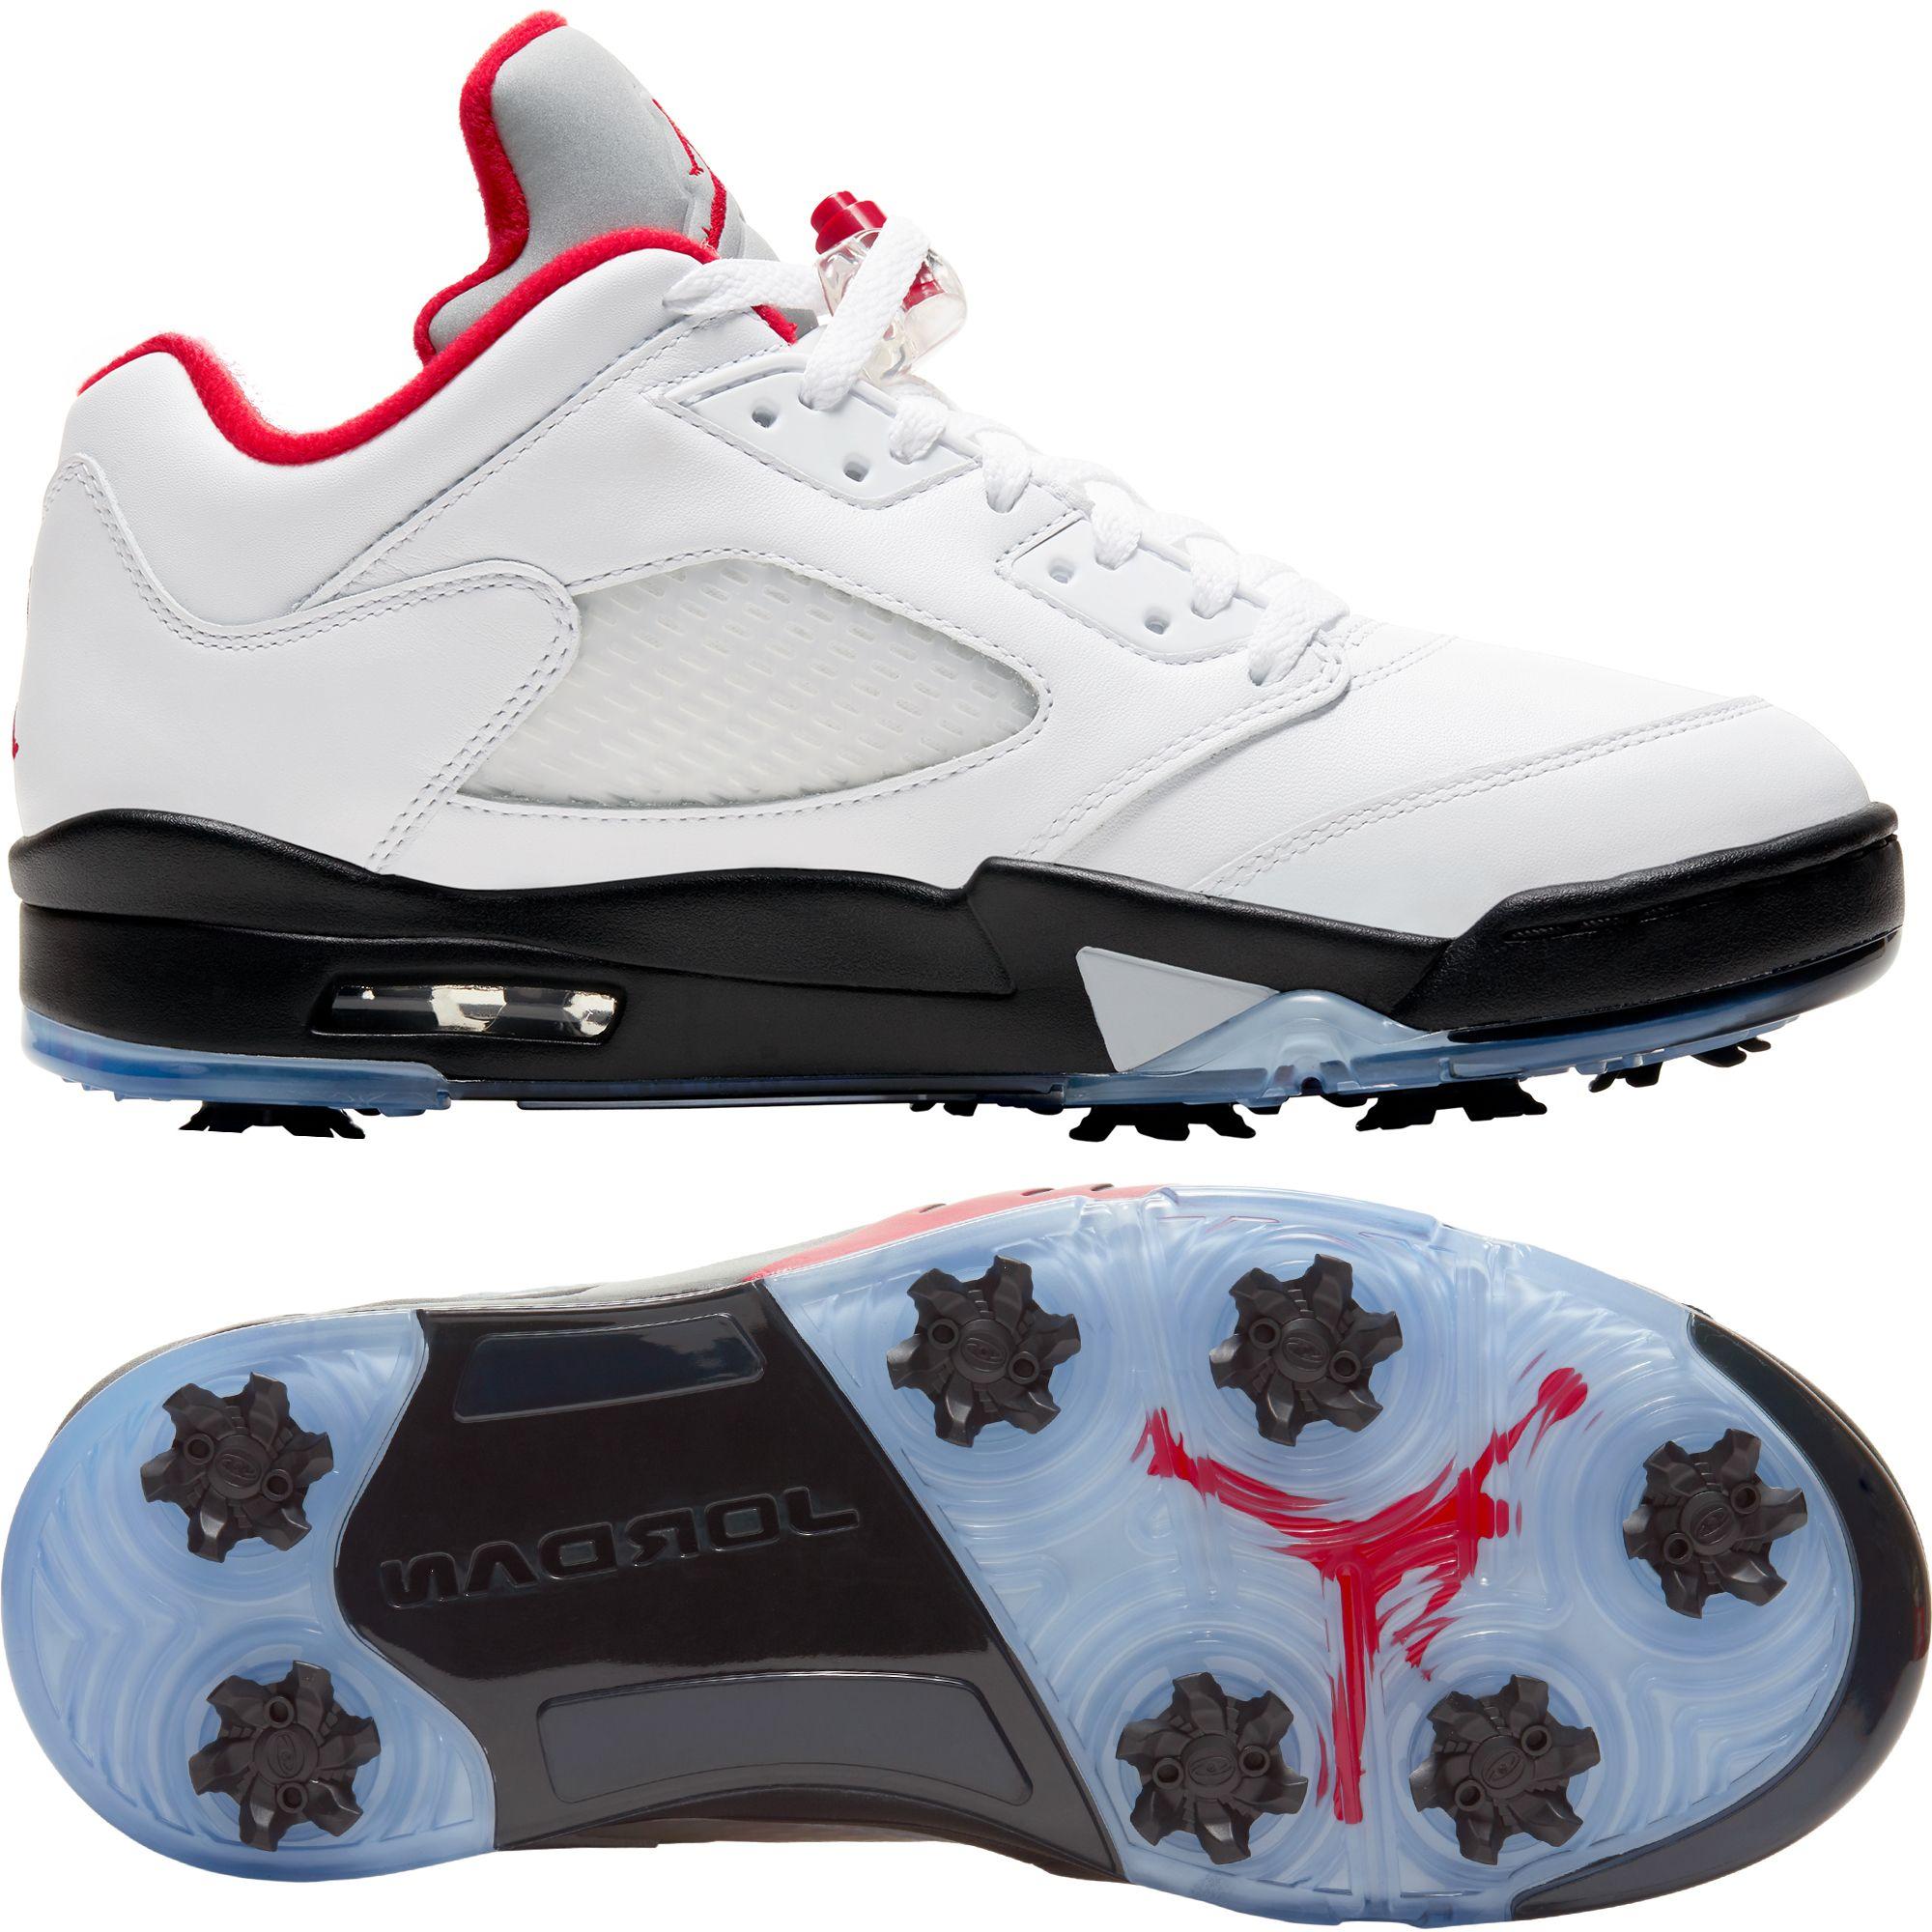 Nike Jordan 5 Low G Golf Shoes Golf Galaxy